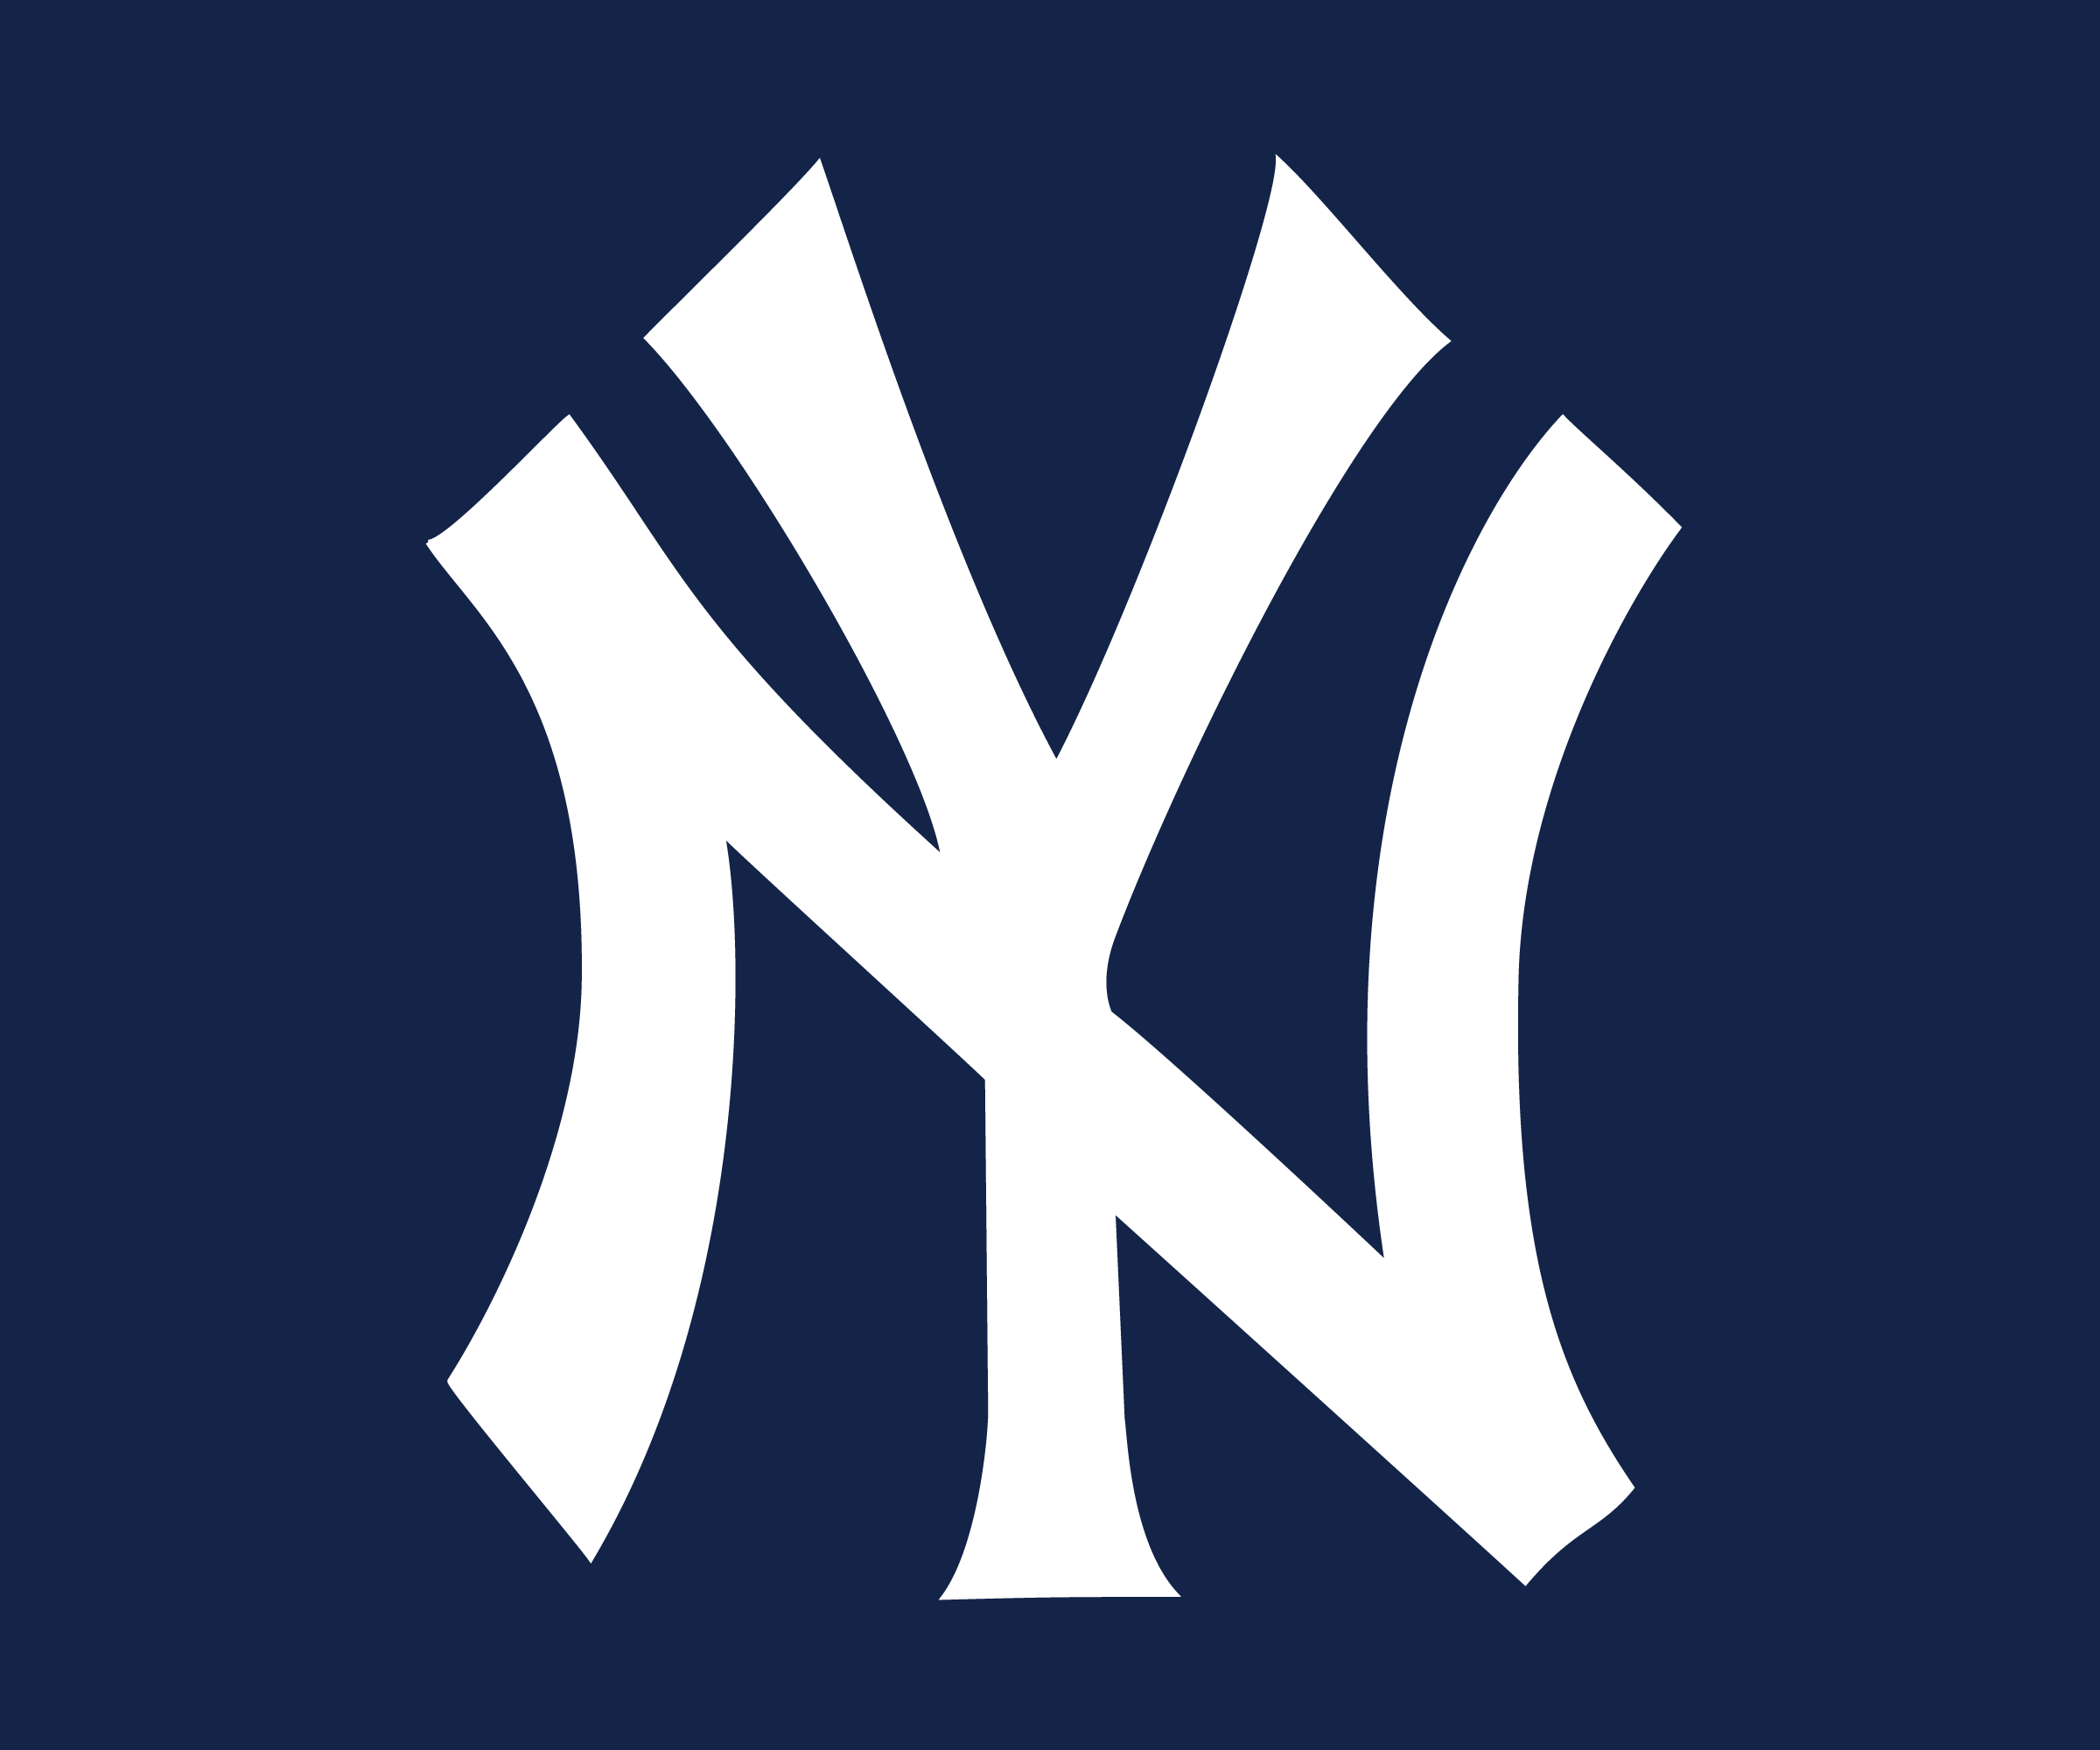 New York Yankees Ny Logo New York Yankees Logo New York Yankees Yankees Logo